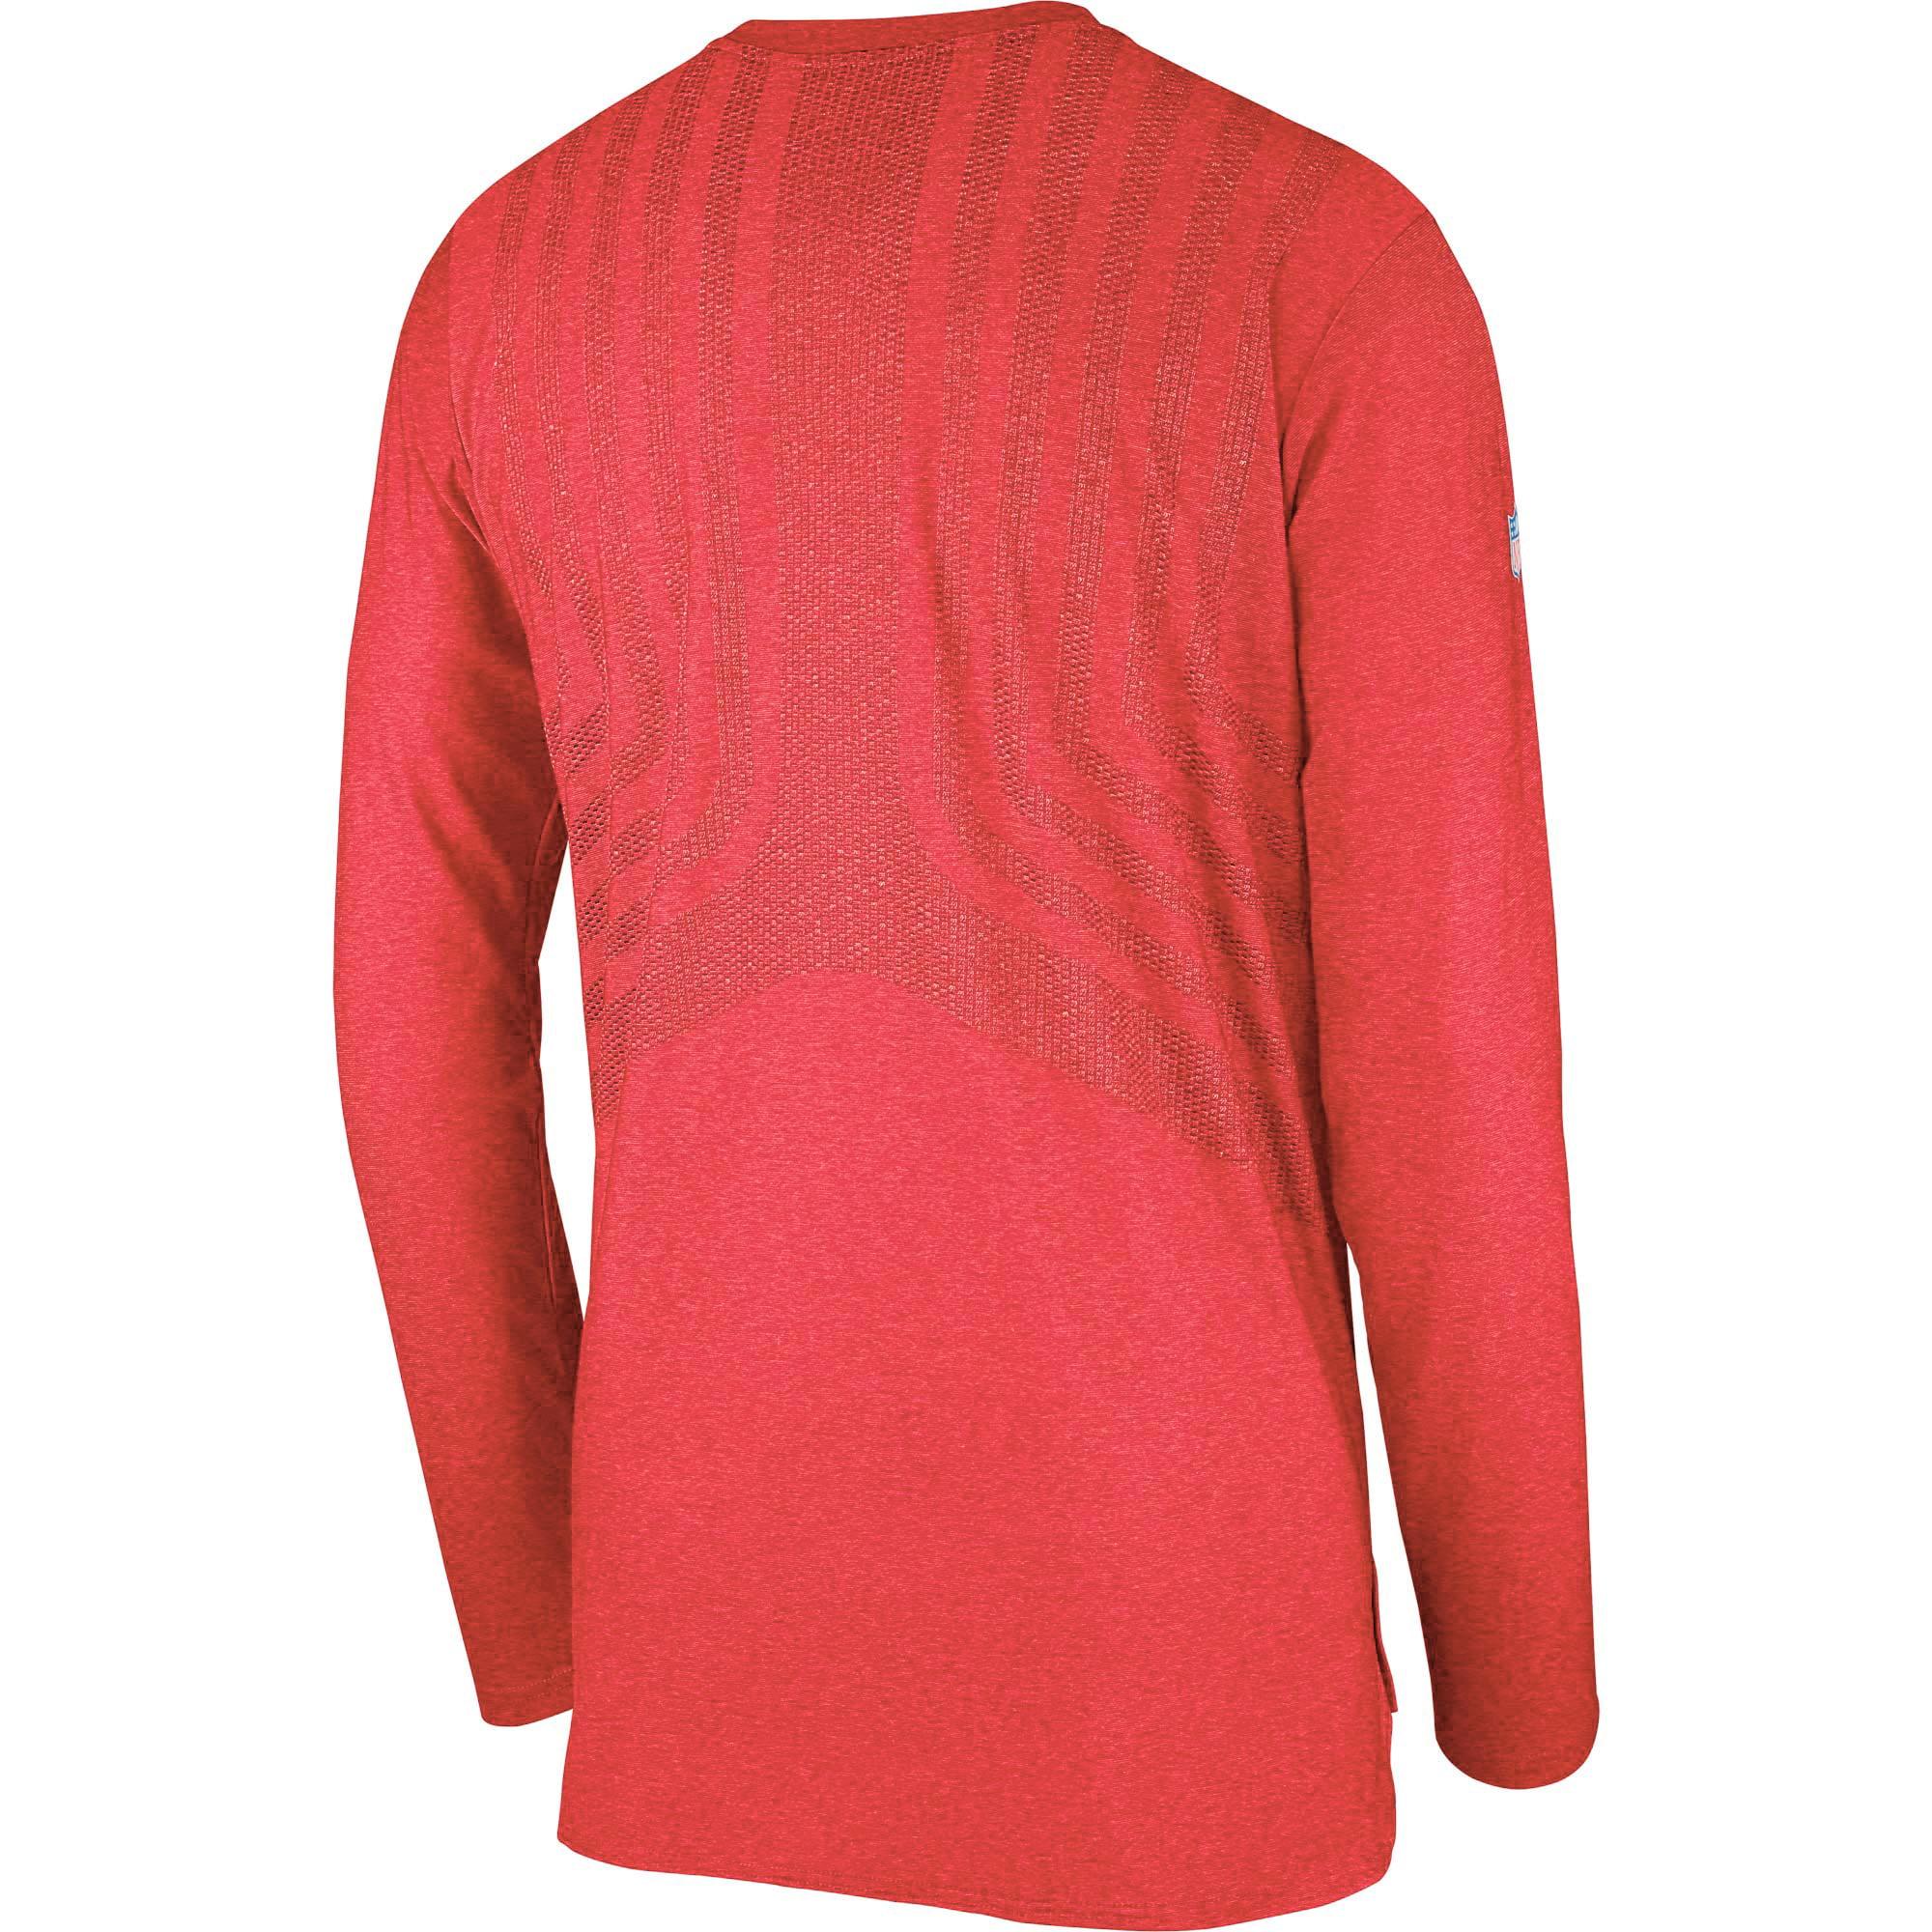 9b79ac95 Kansas City Chiefs Nike Sideline Player Long Sleeve T-Shirt - Red